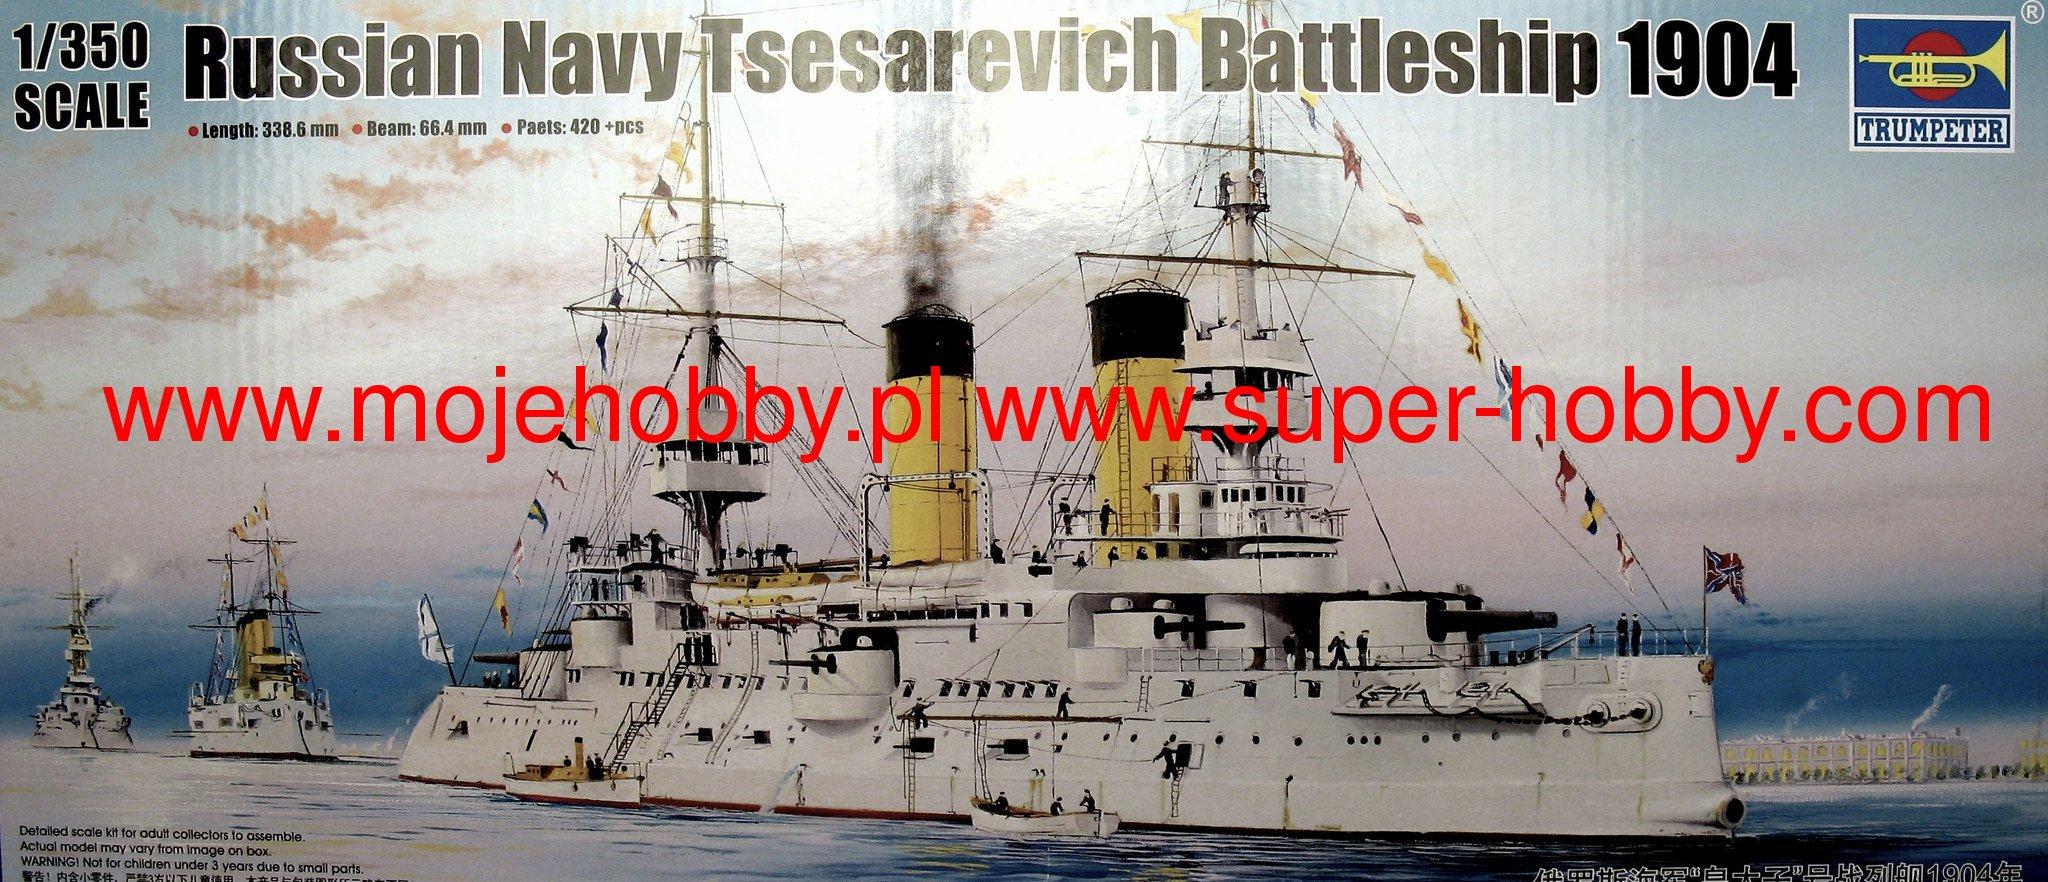 Trumpeter 5338 Modellbau Schiffahrt Russian Navy Tsesarevich Battleship 1904